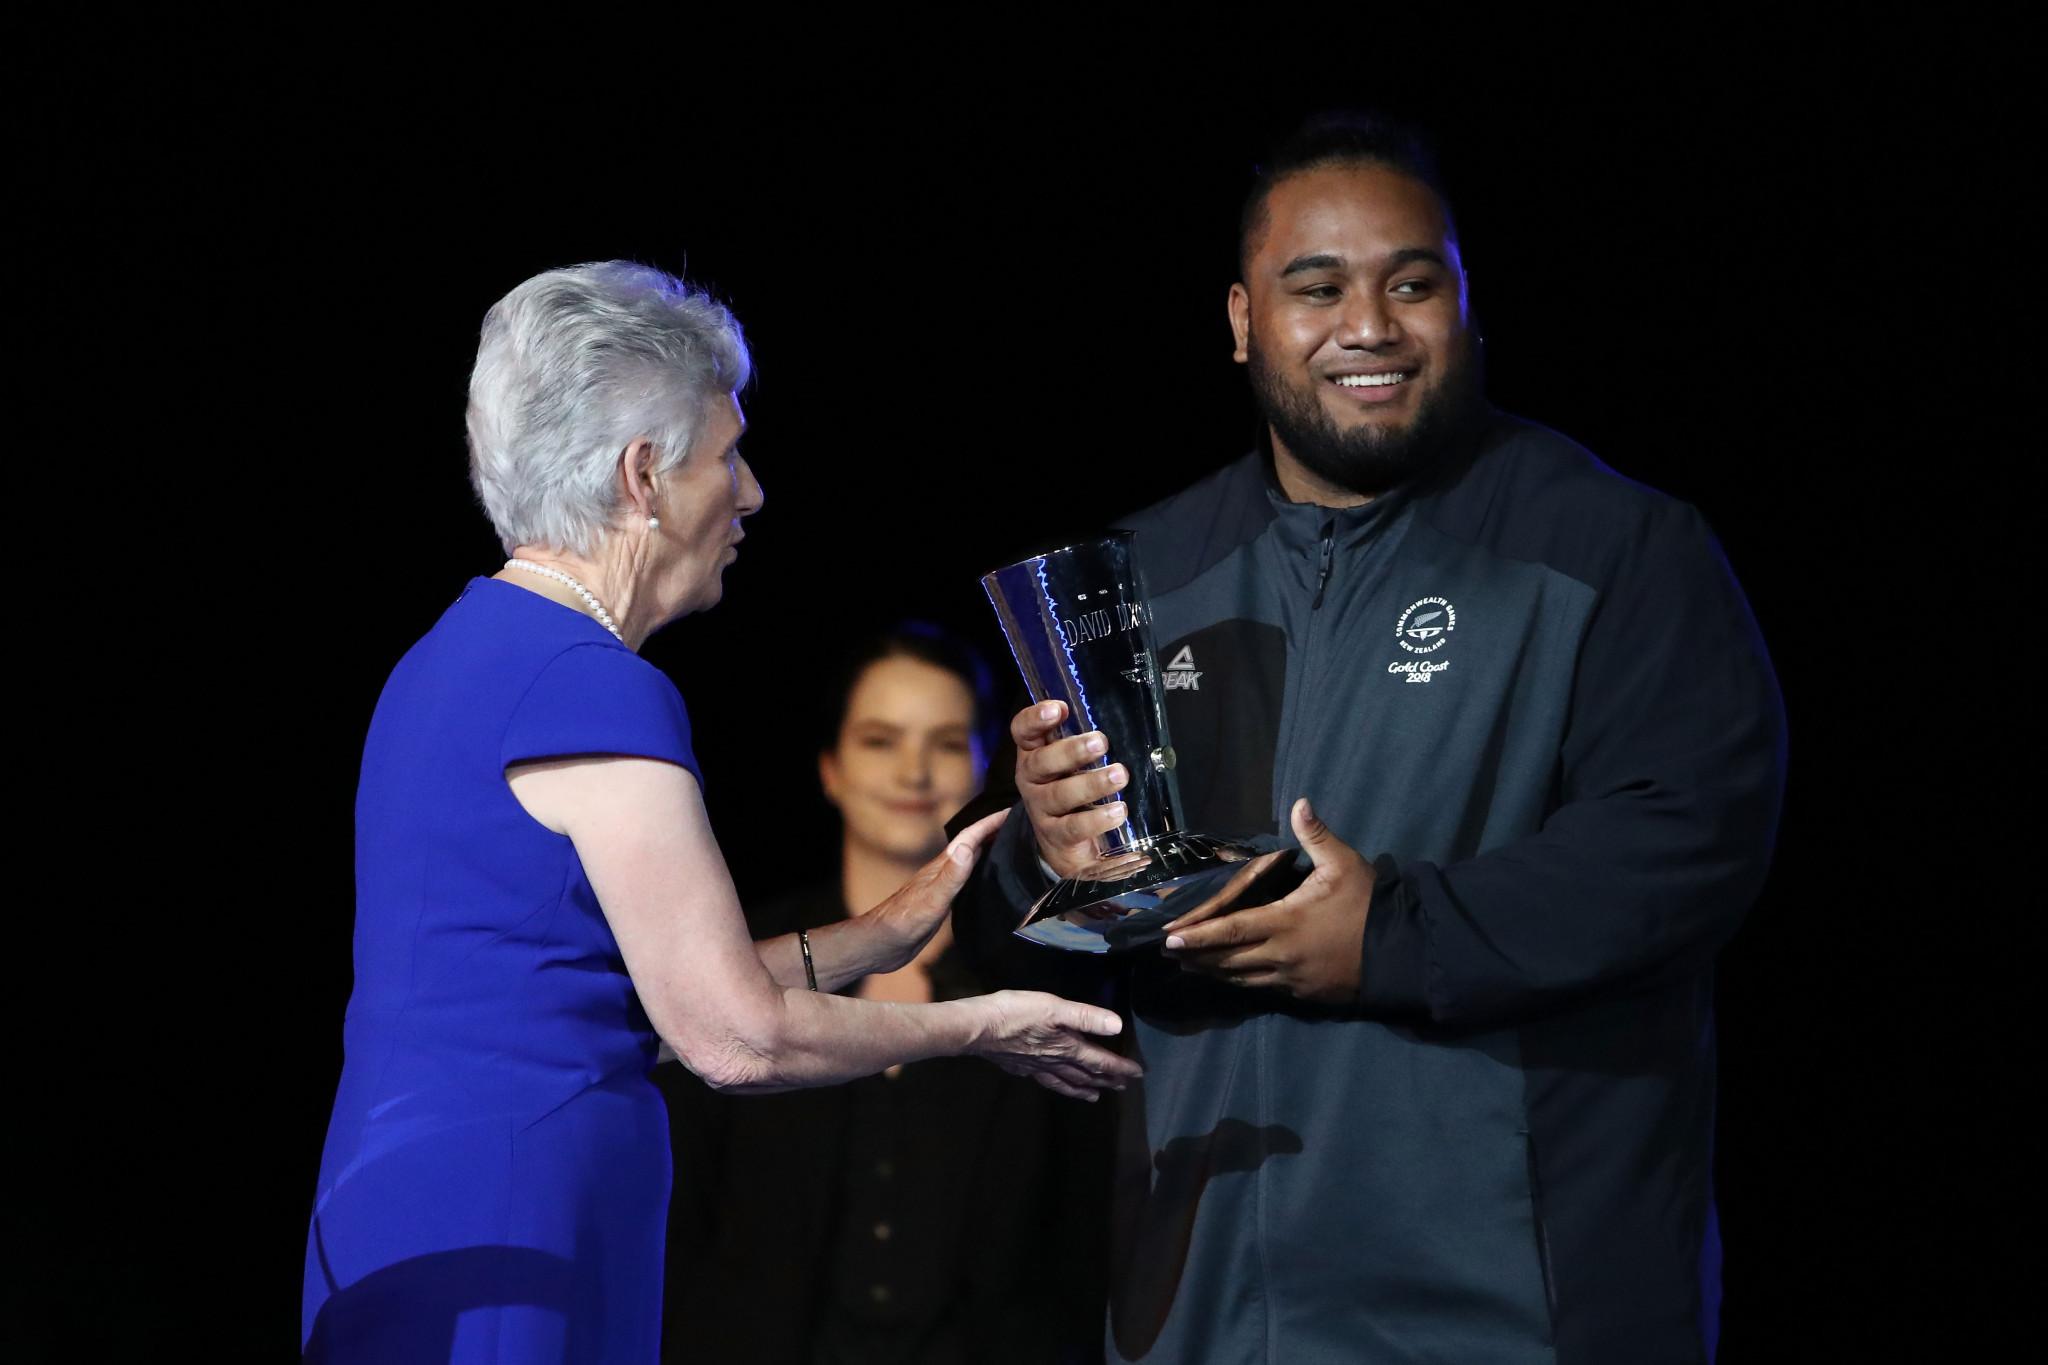 New Zealand weightlifter Liti given David Dixon Award for sportsmanship during Gold Coast 2018